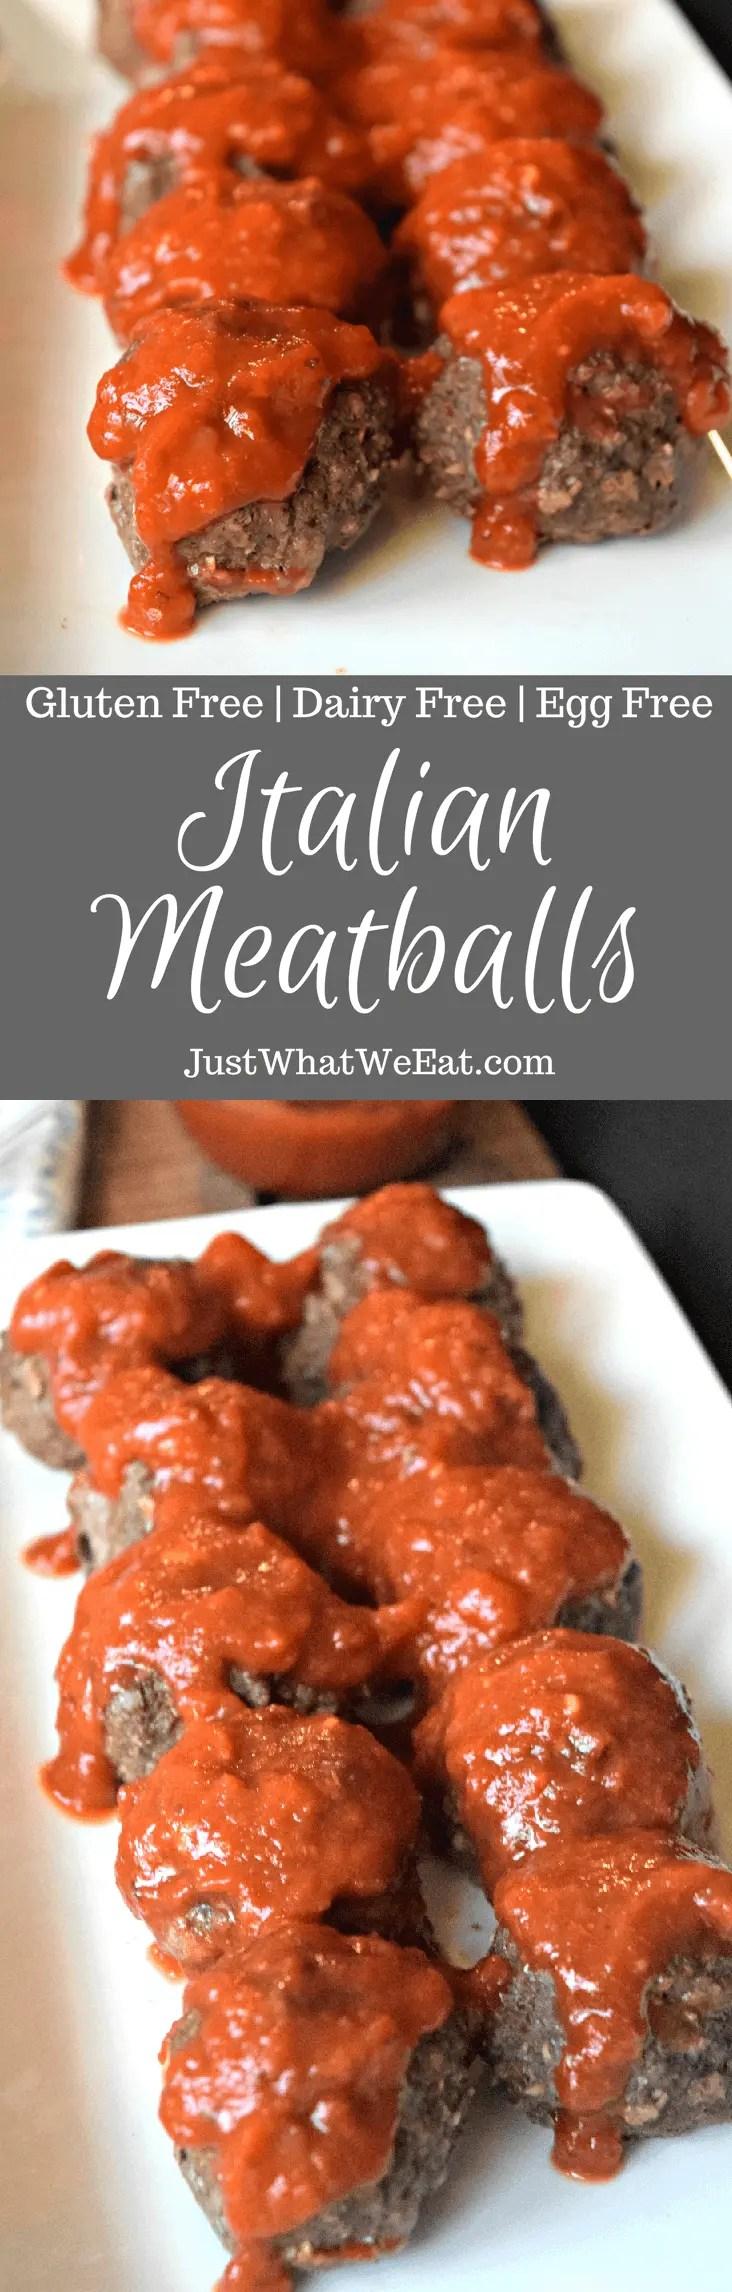 Italian Meatballs - Gluten Free, Dairy Free, & Egg Free